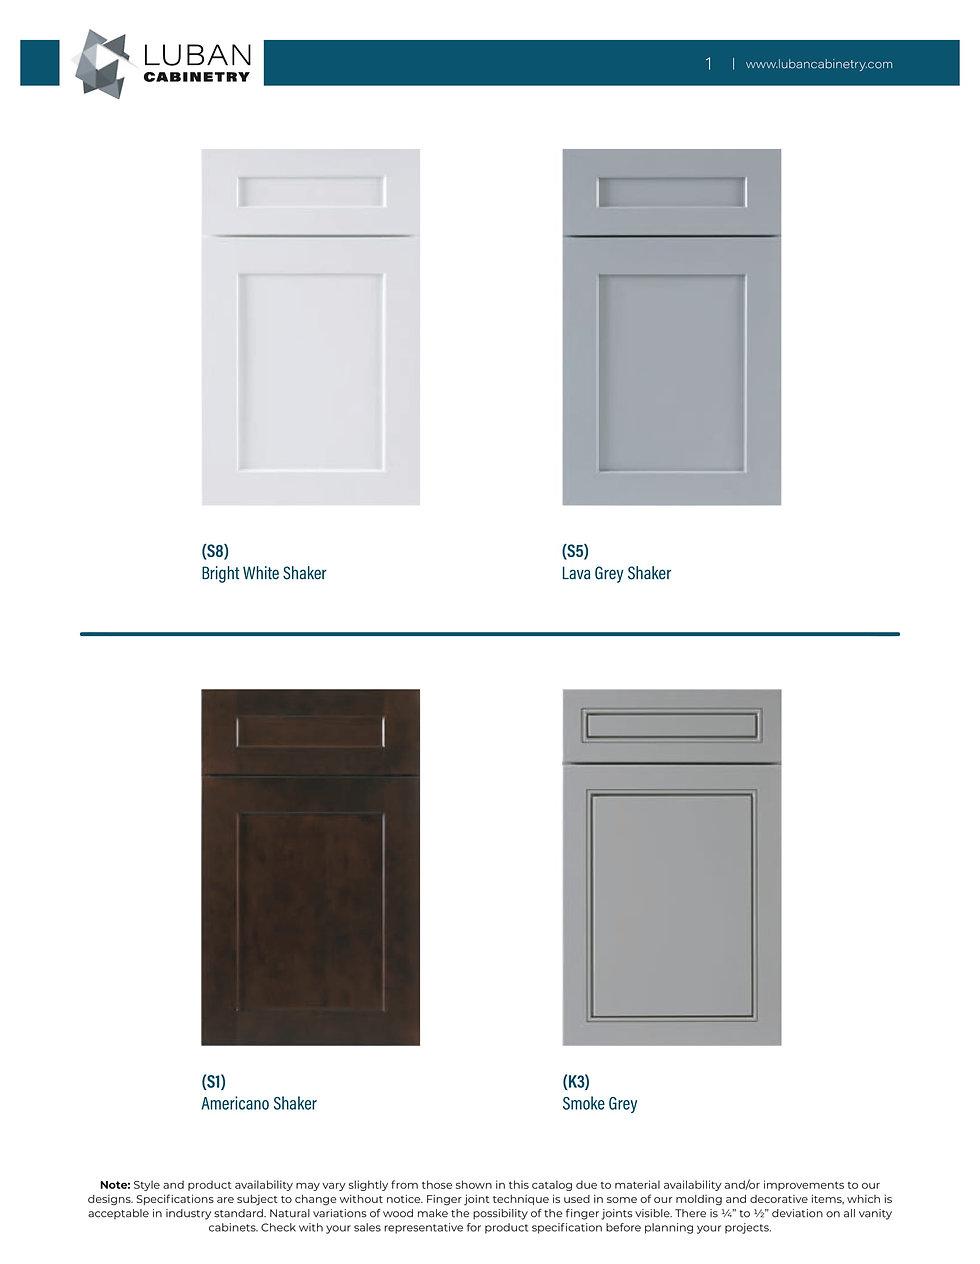 catalogue-cabinetry02 copy copy-4.jpg